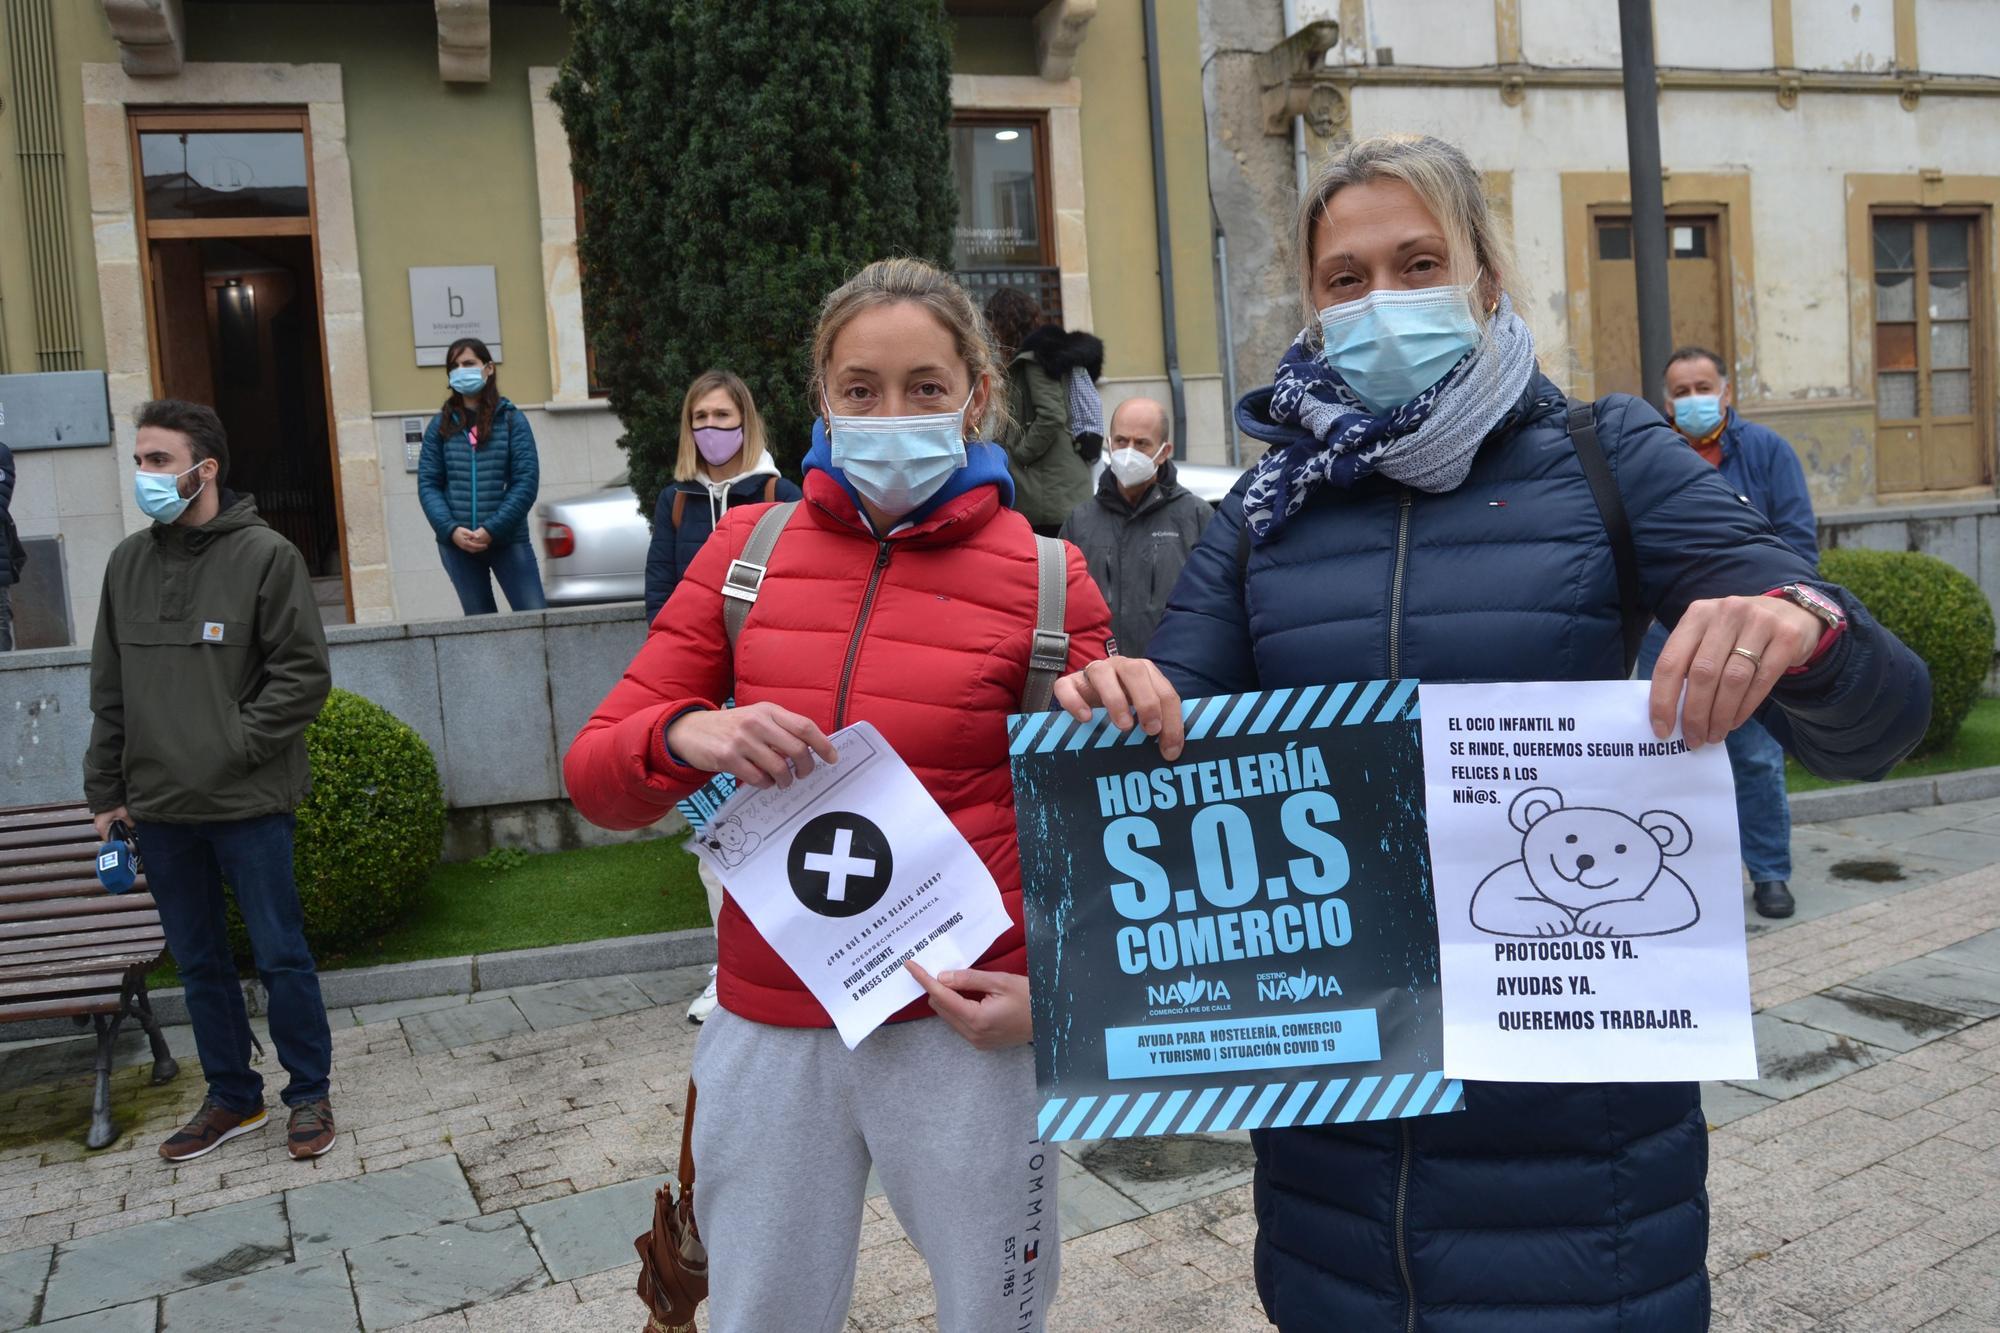 protestas en Navia 6.jpg